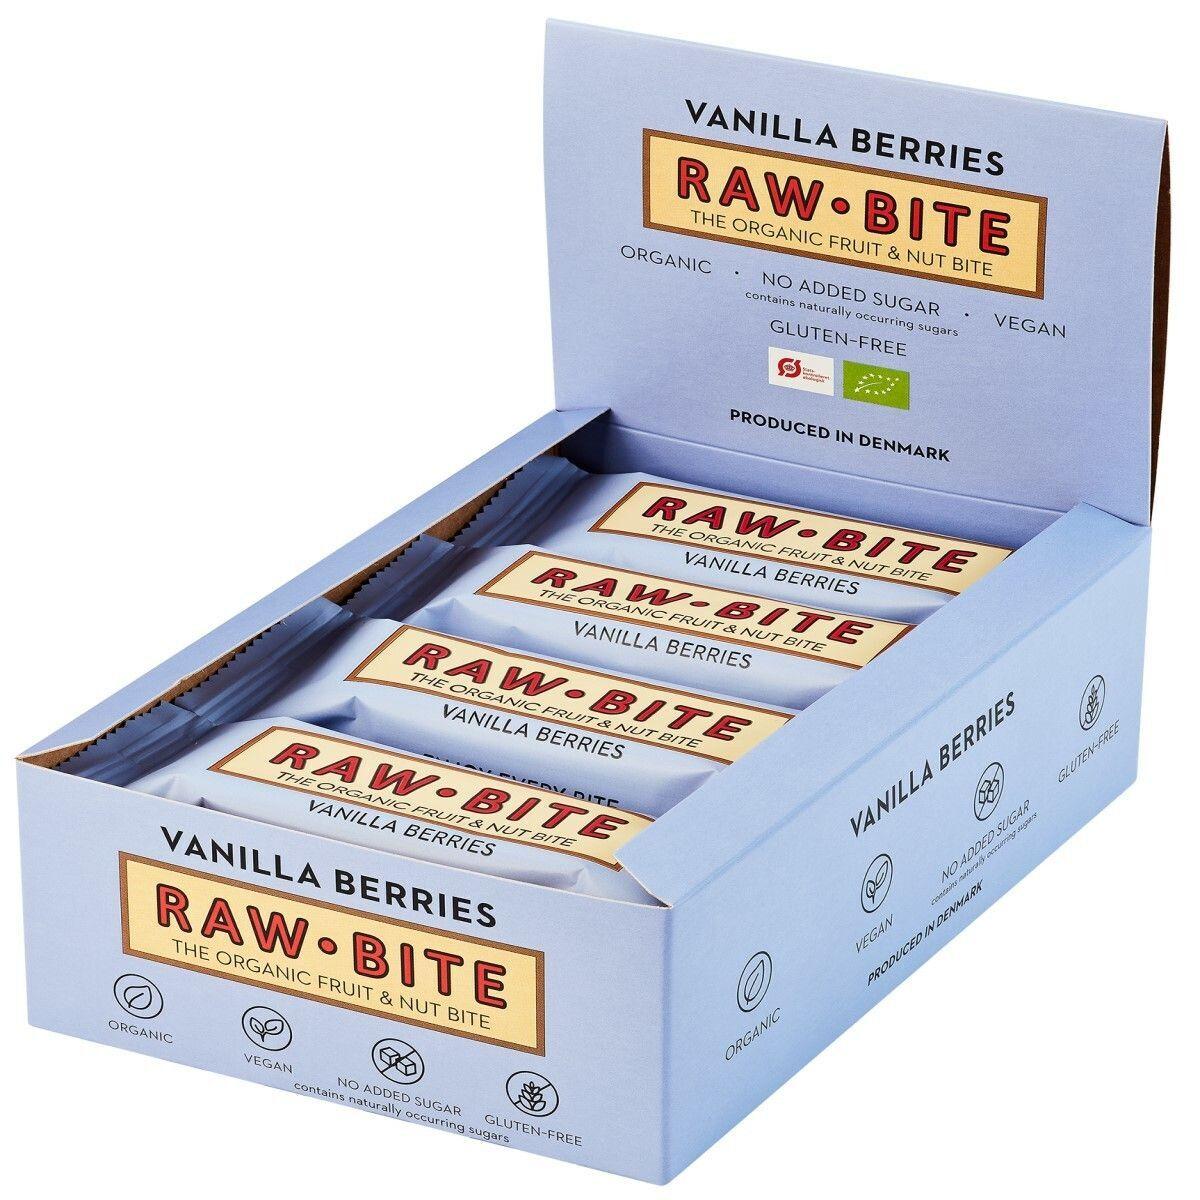 Rawbite RAW BITE Bio Barres Baies de vanille g Barre